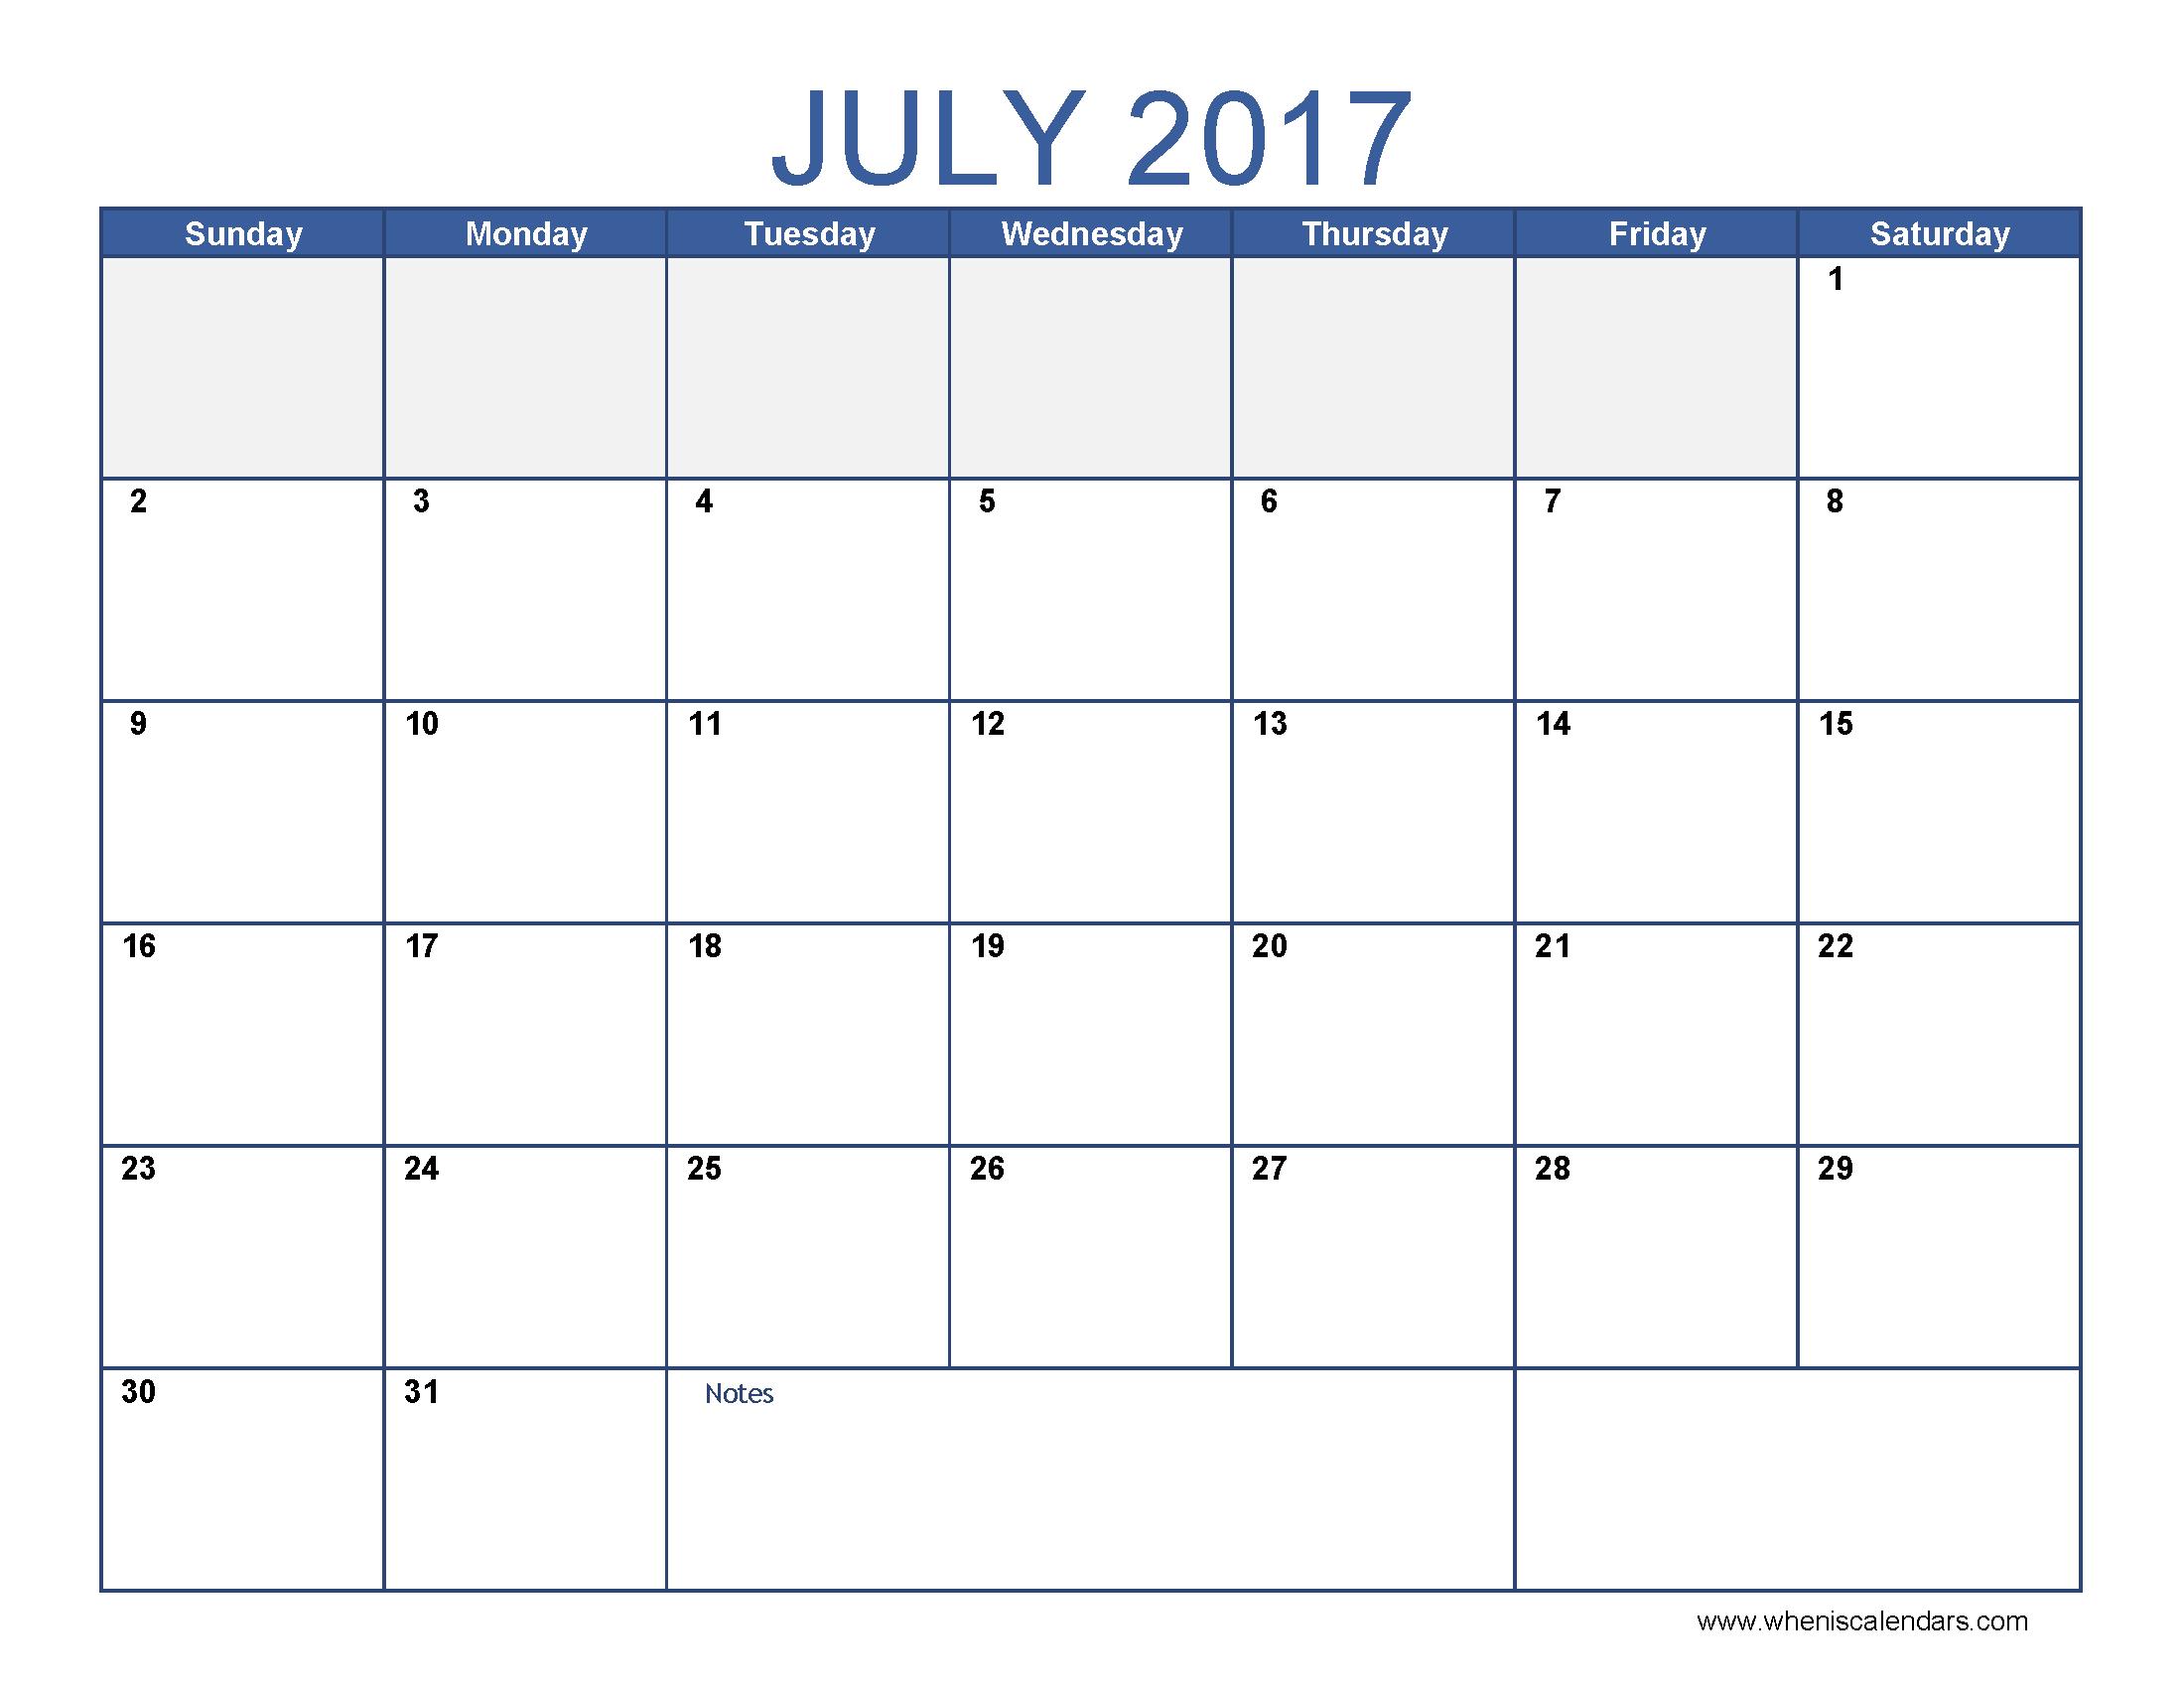 July 2017 Calendar Template | blank calendar printable